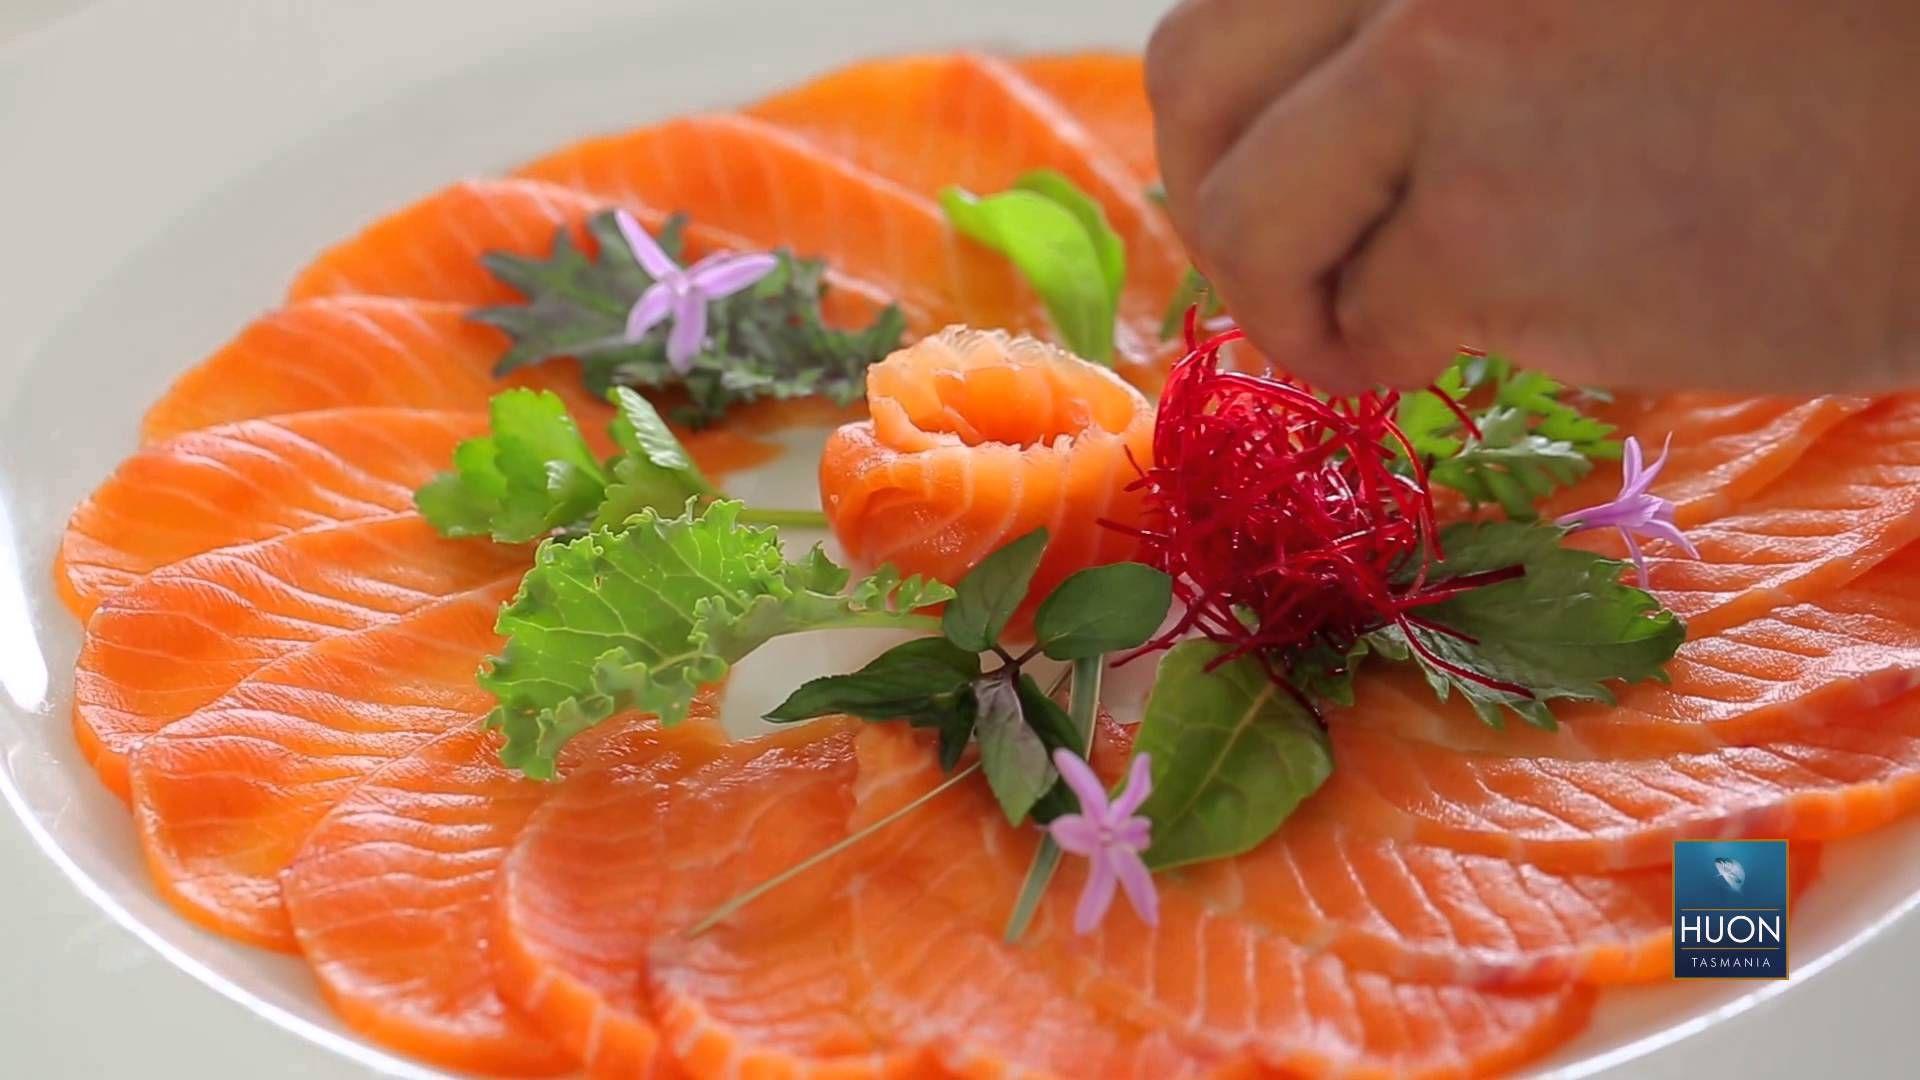 How To Make Huon Salmon Sashimi With Masaaki Salmon Sashimi Sashimi Sashimi Platter